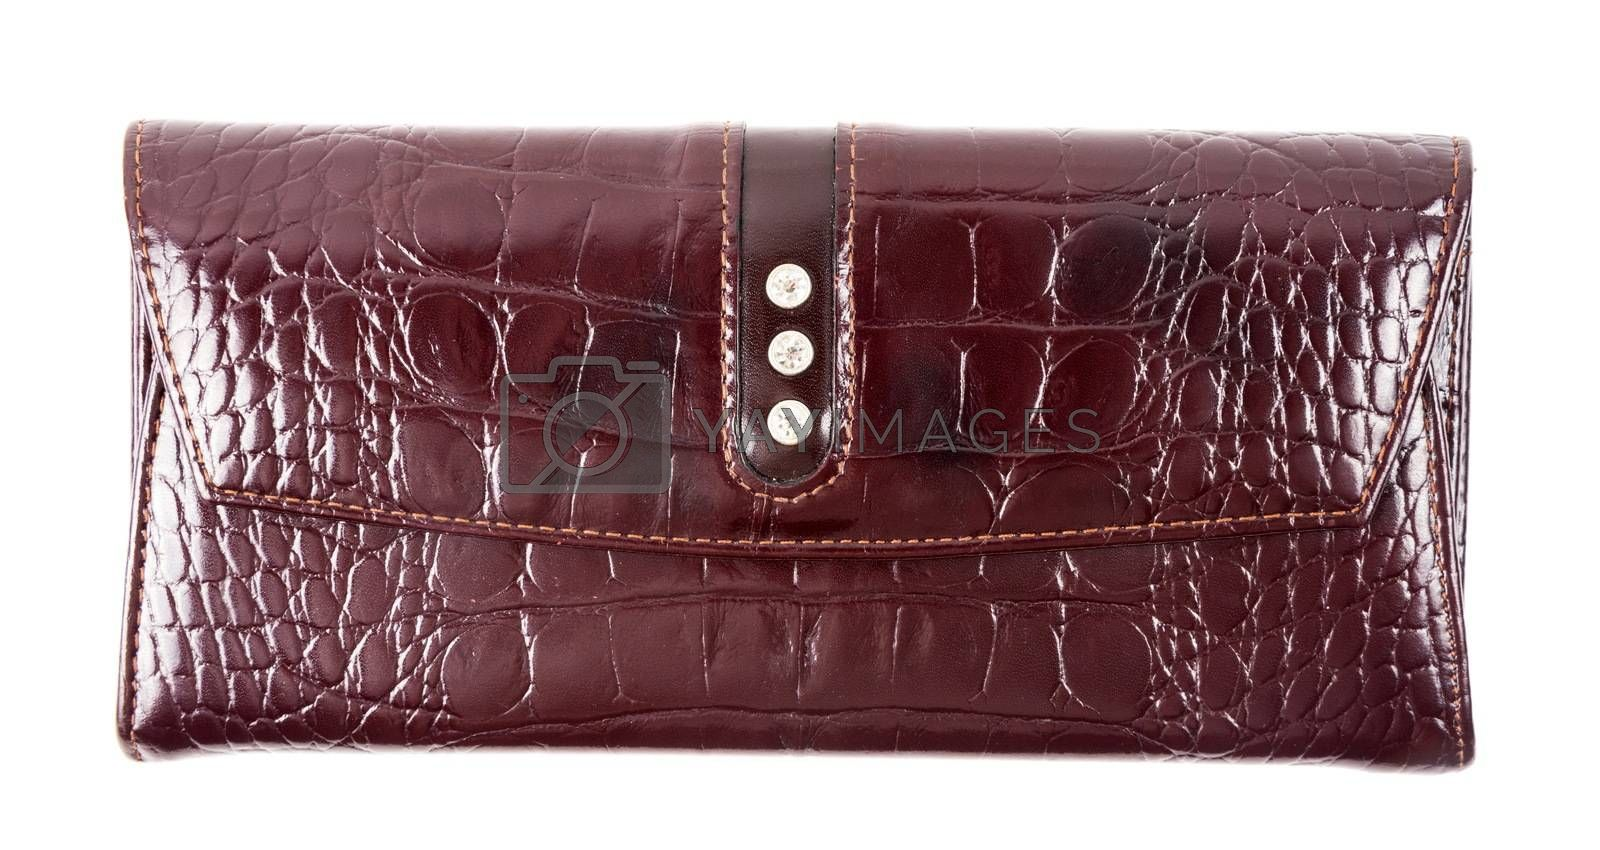 Closeup of the fashion wallet on white